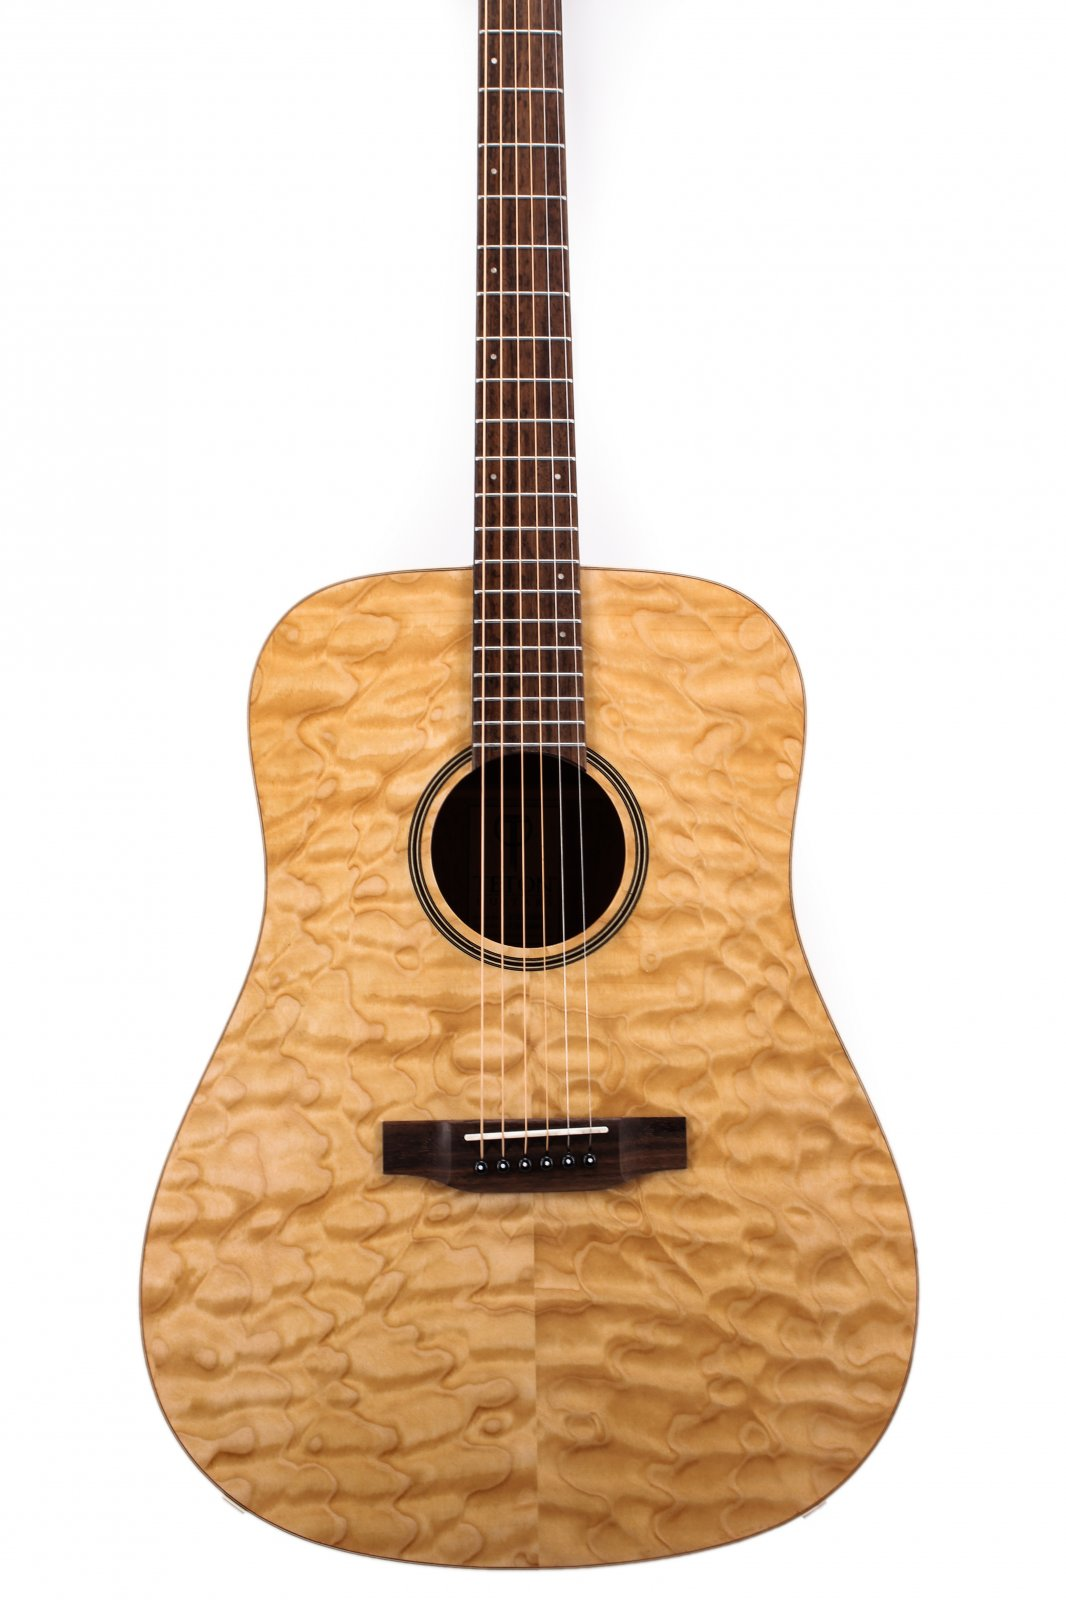 Teton STS000QMG Quilt Maple Veneer/Solid Top Dreadnaught Acoustic